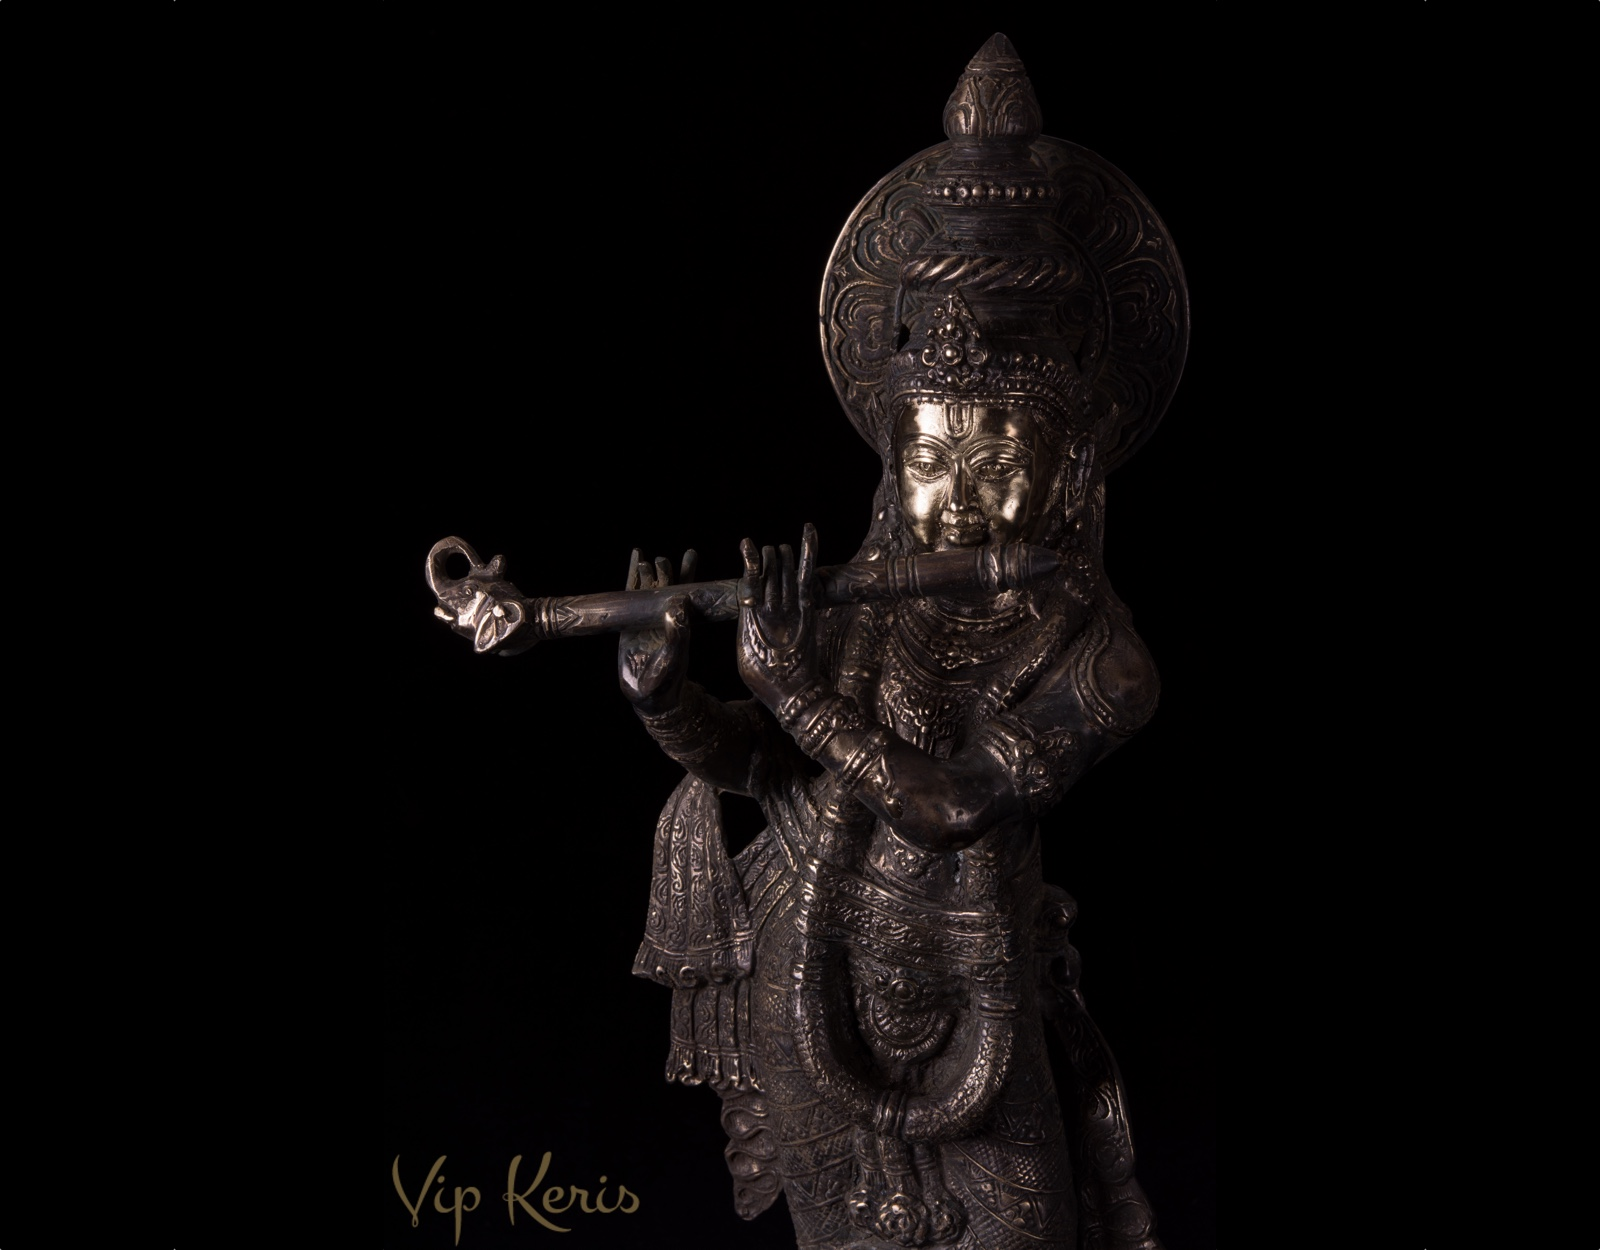 Бронзовая статуя Кришна, 70см. фото VipKeris